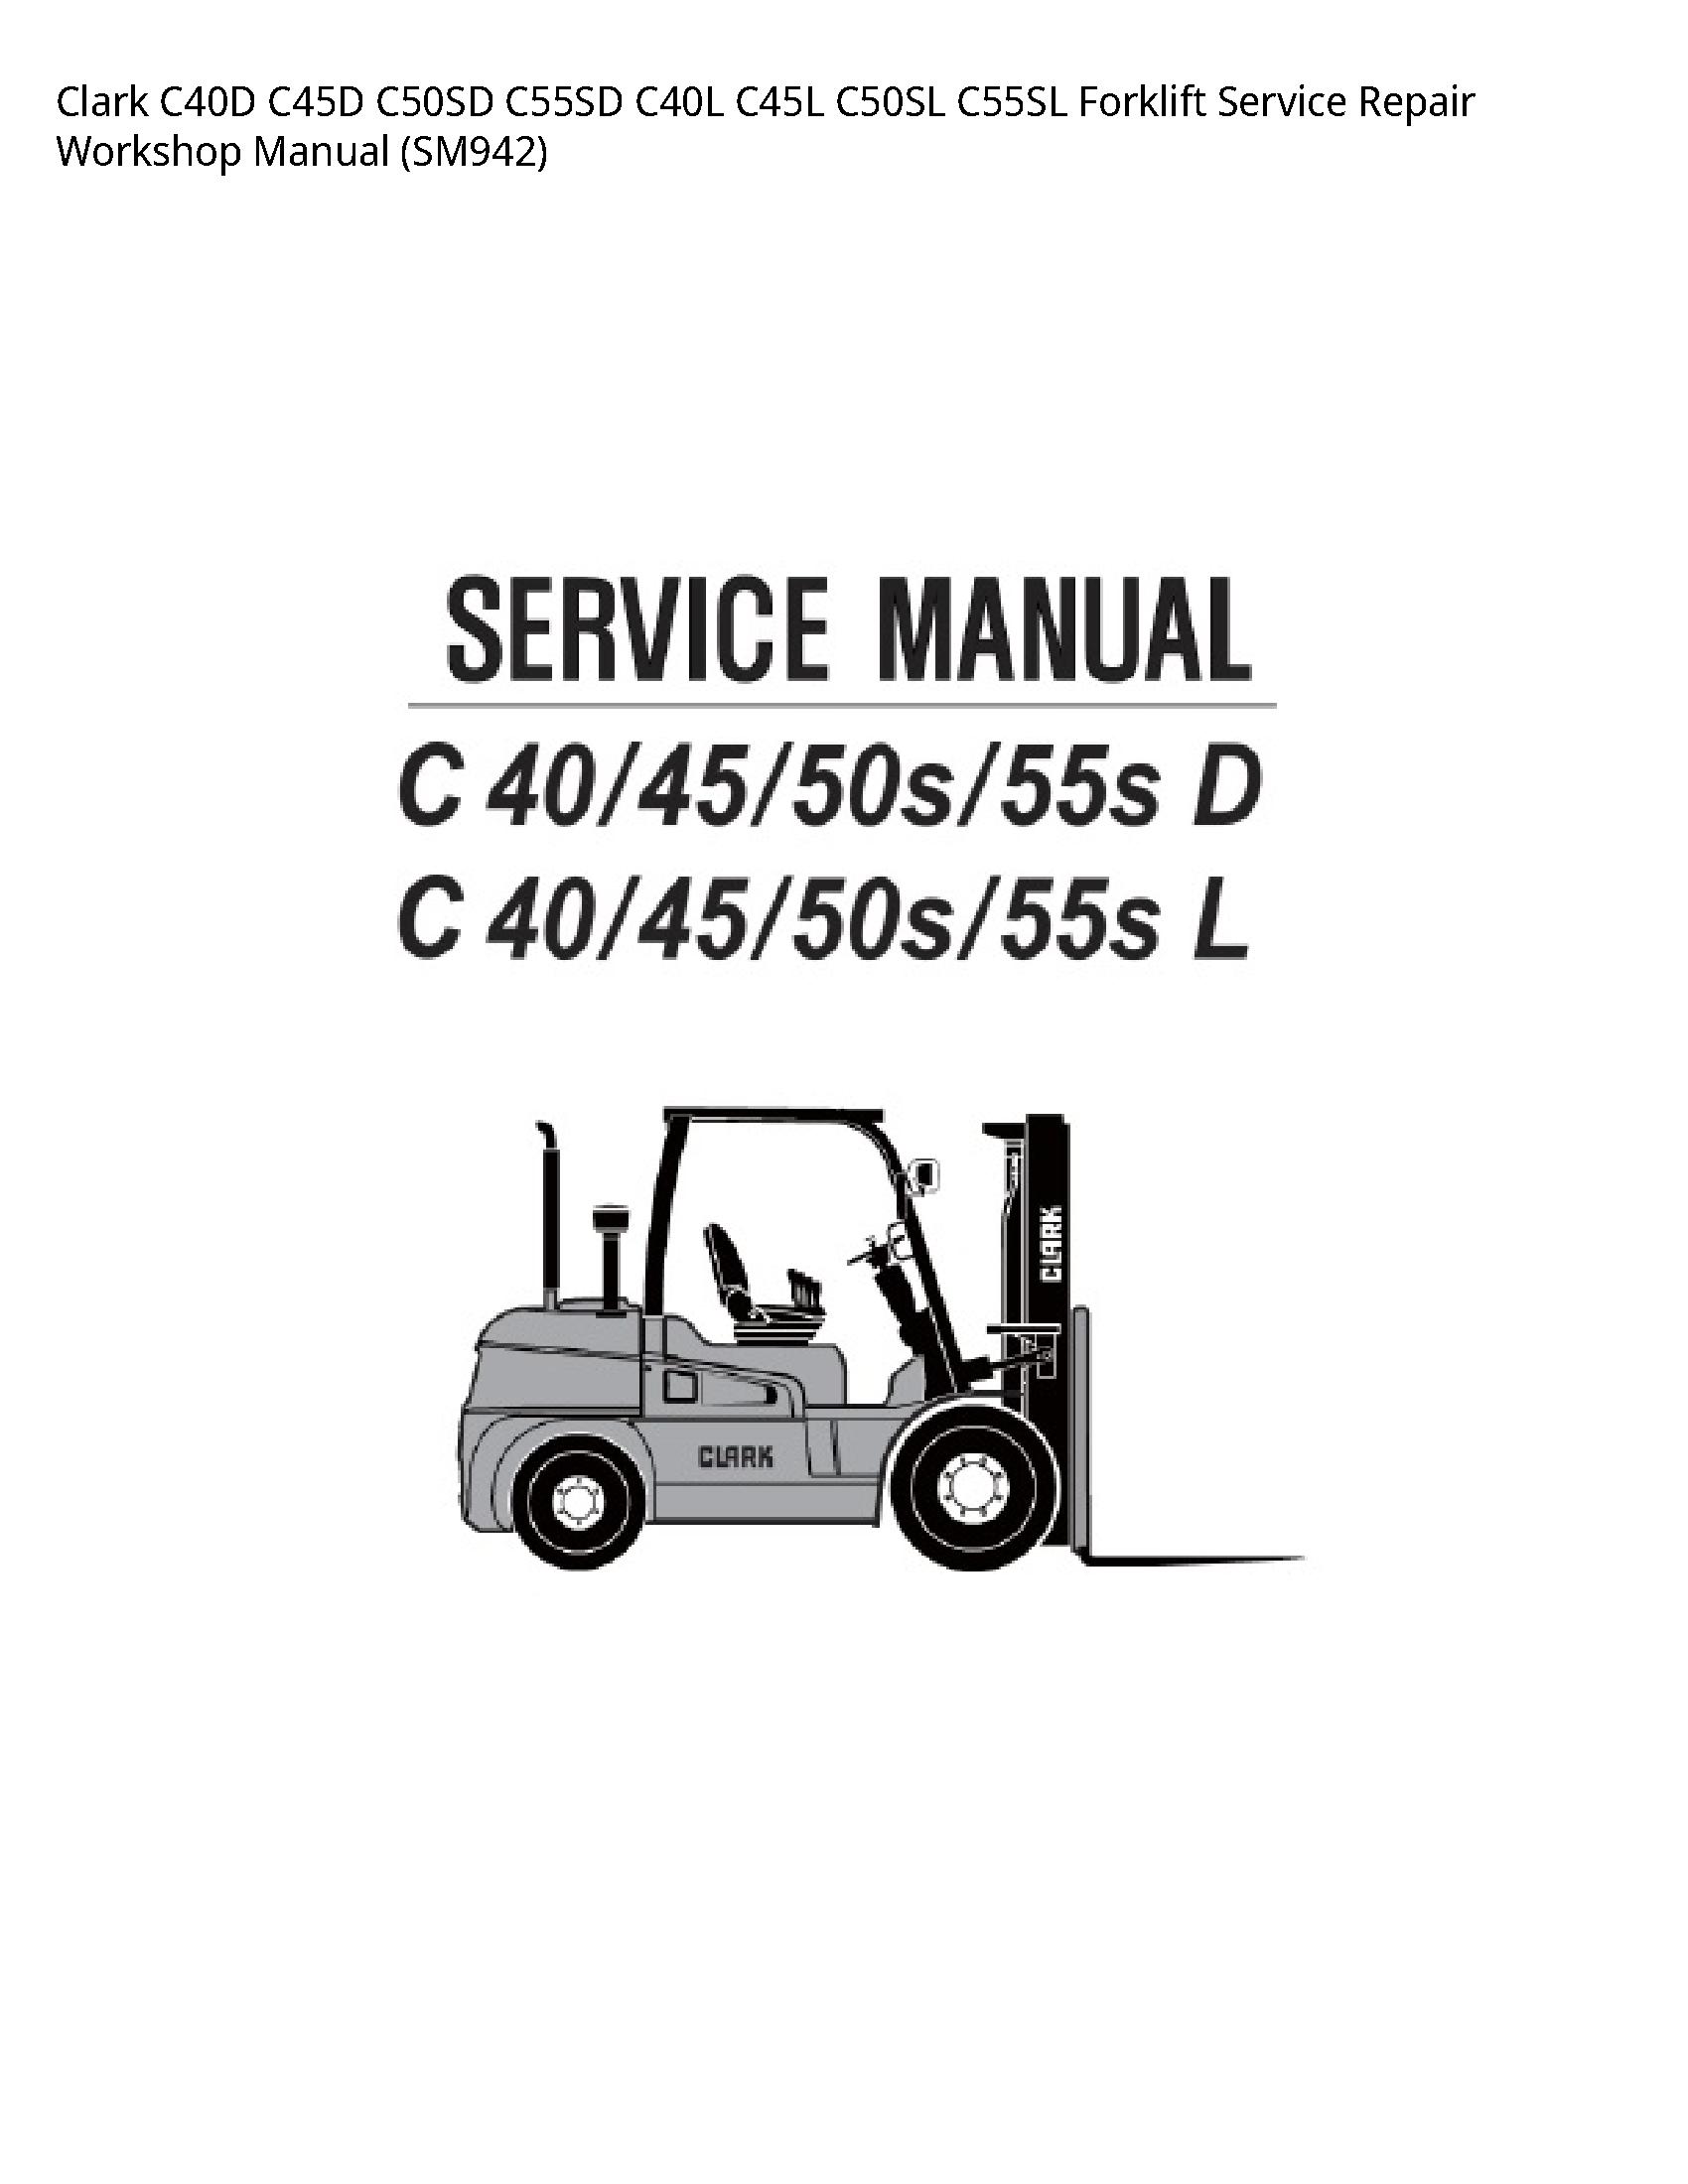 Clark C40D Forklift manual